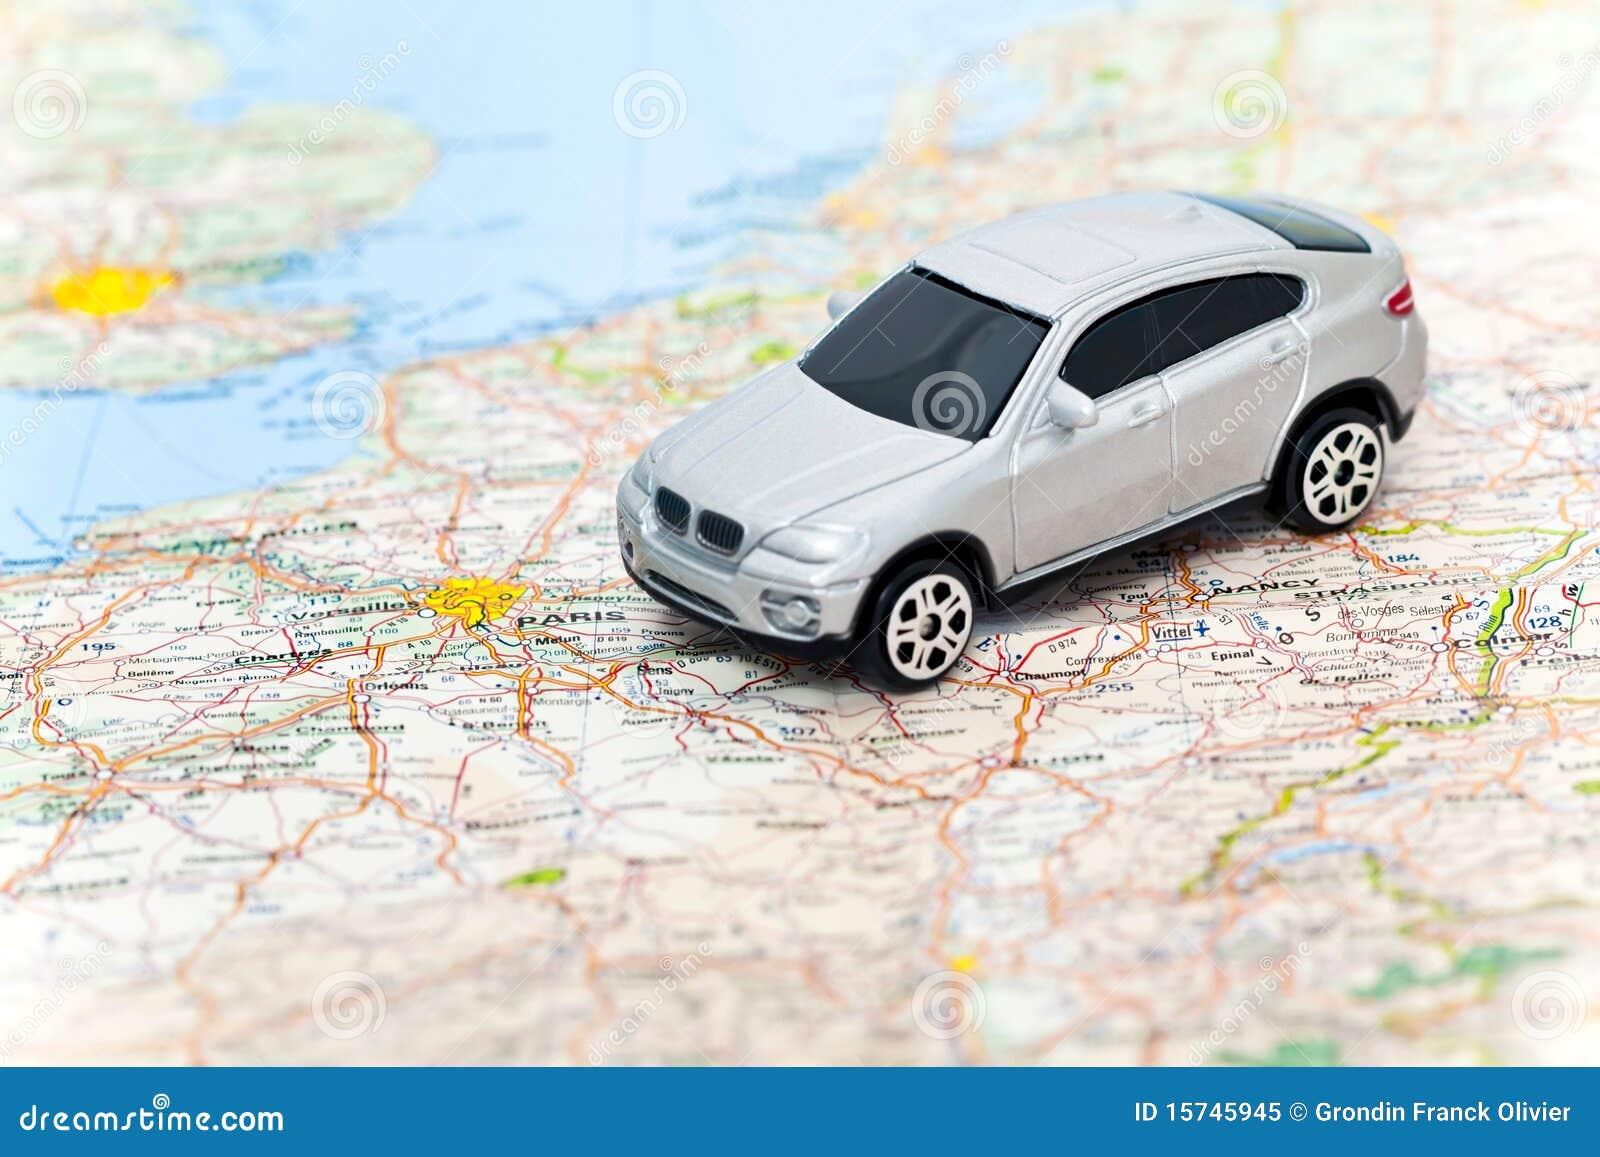 model car on map of france royalty free stock photo image 15745945. Black Bedroom Furniture Sets. Home Design Ideas